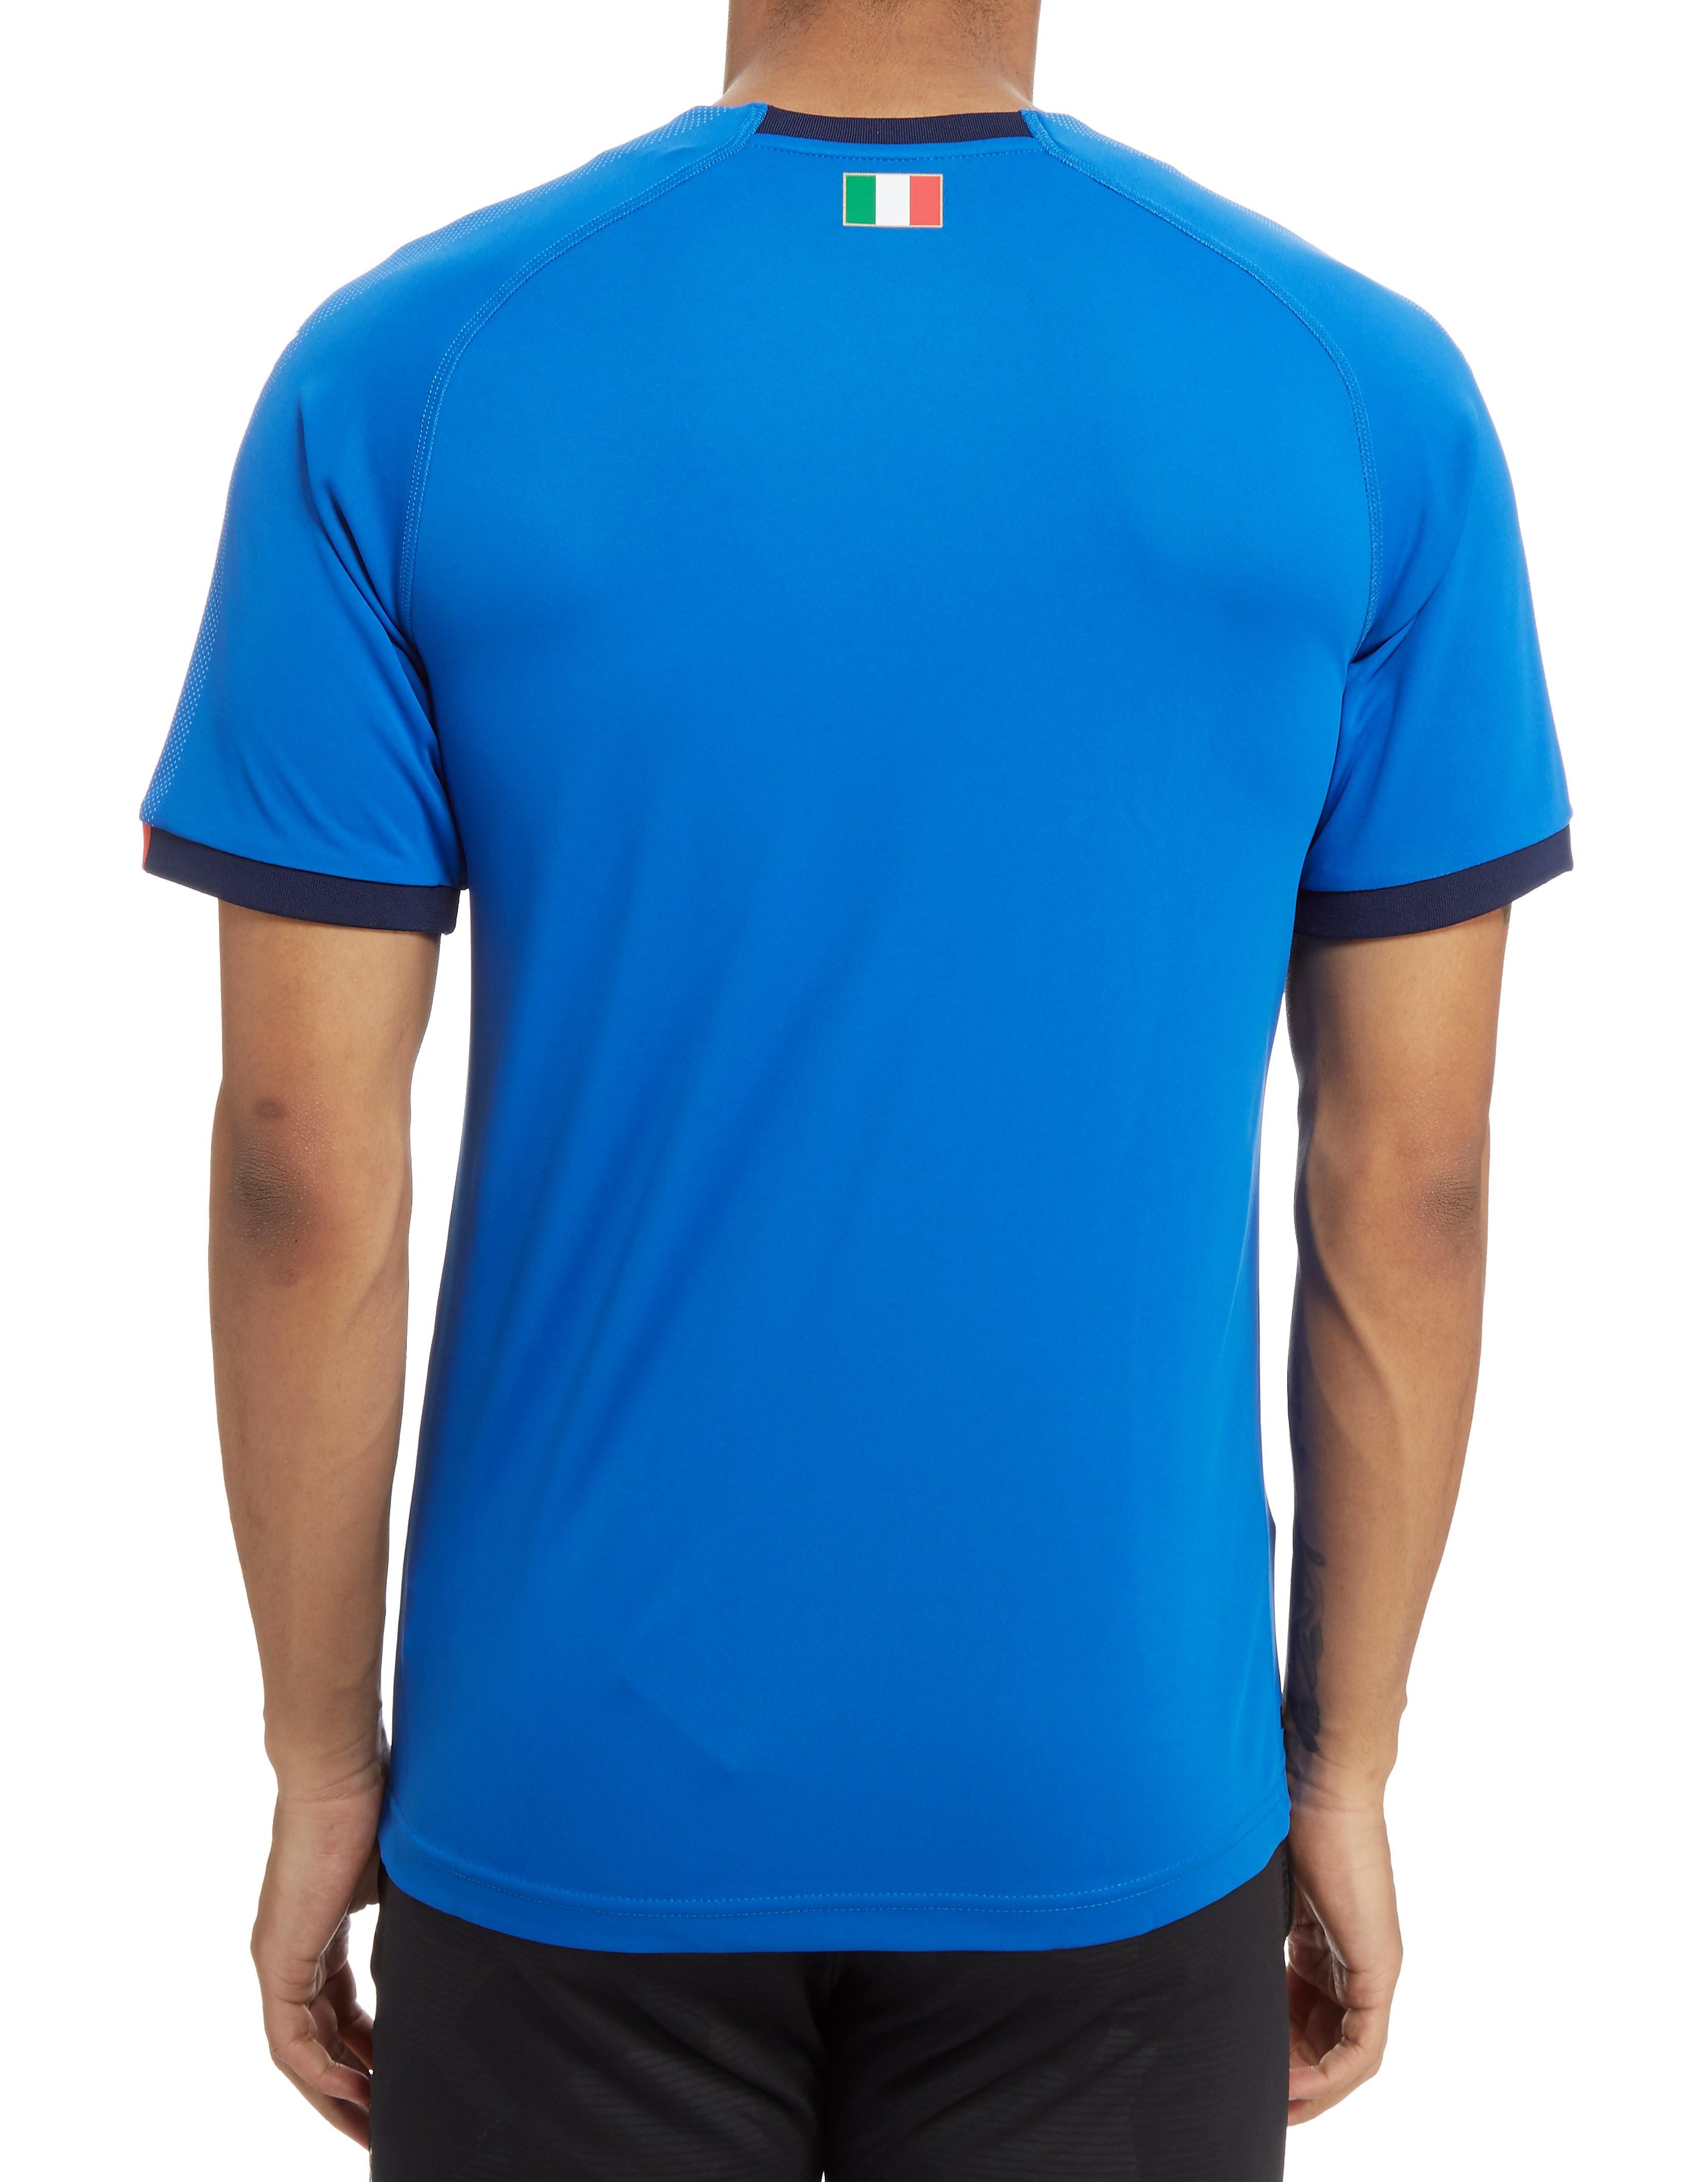 PUMA camiseta 1.ª equipación Italia 2018